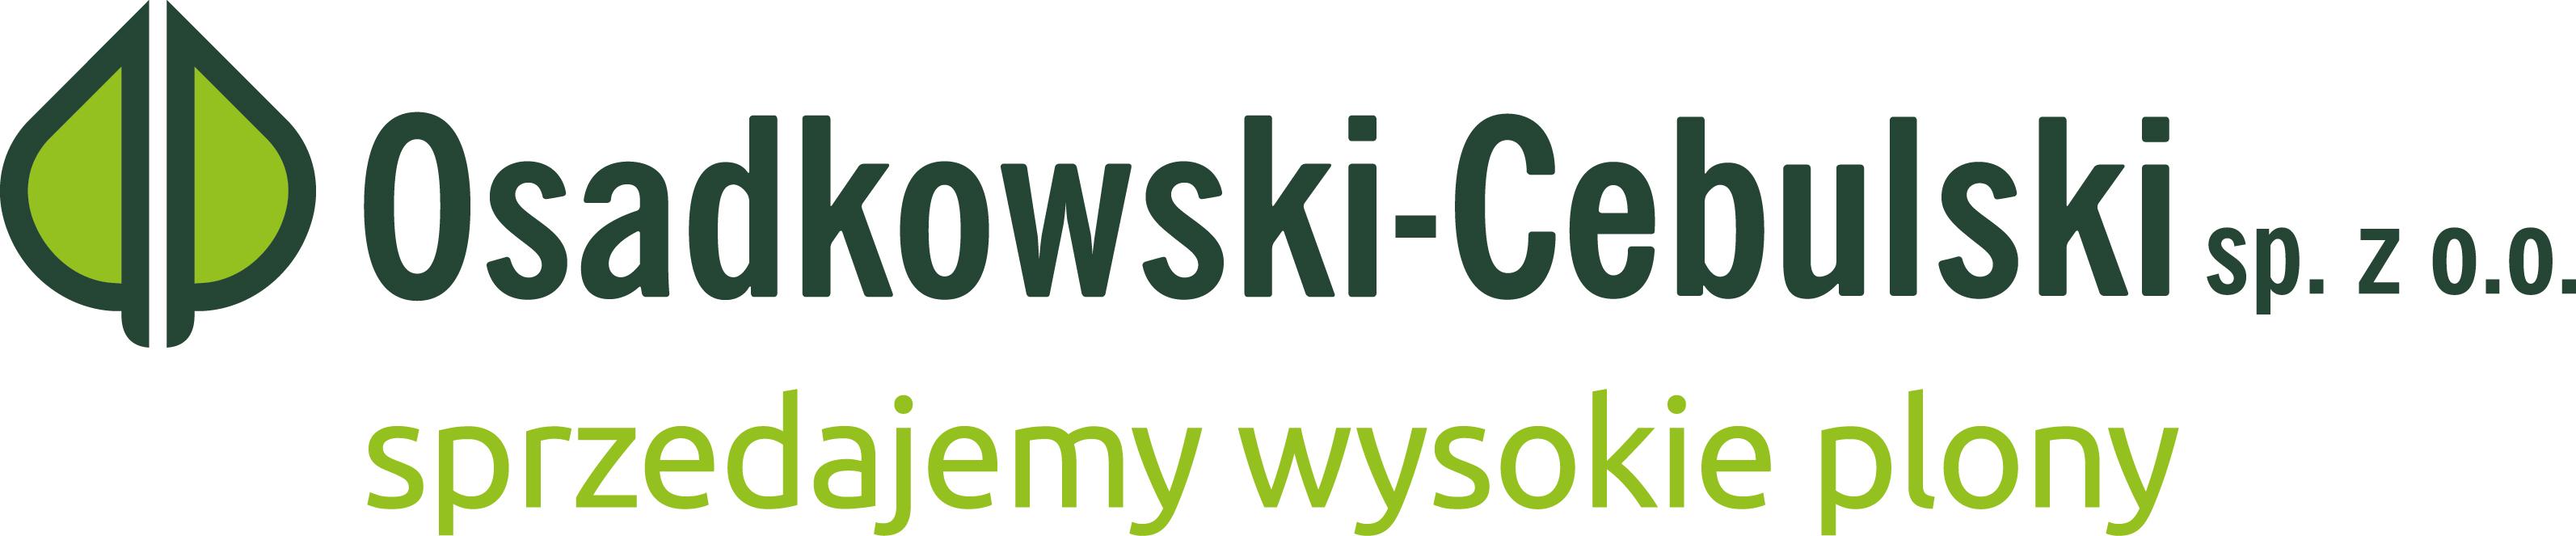 Osadkowski-Cebulski